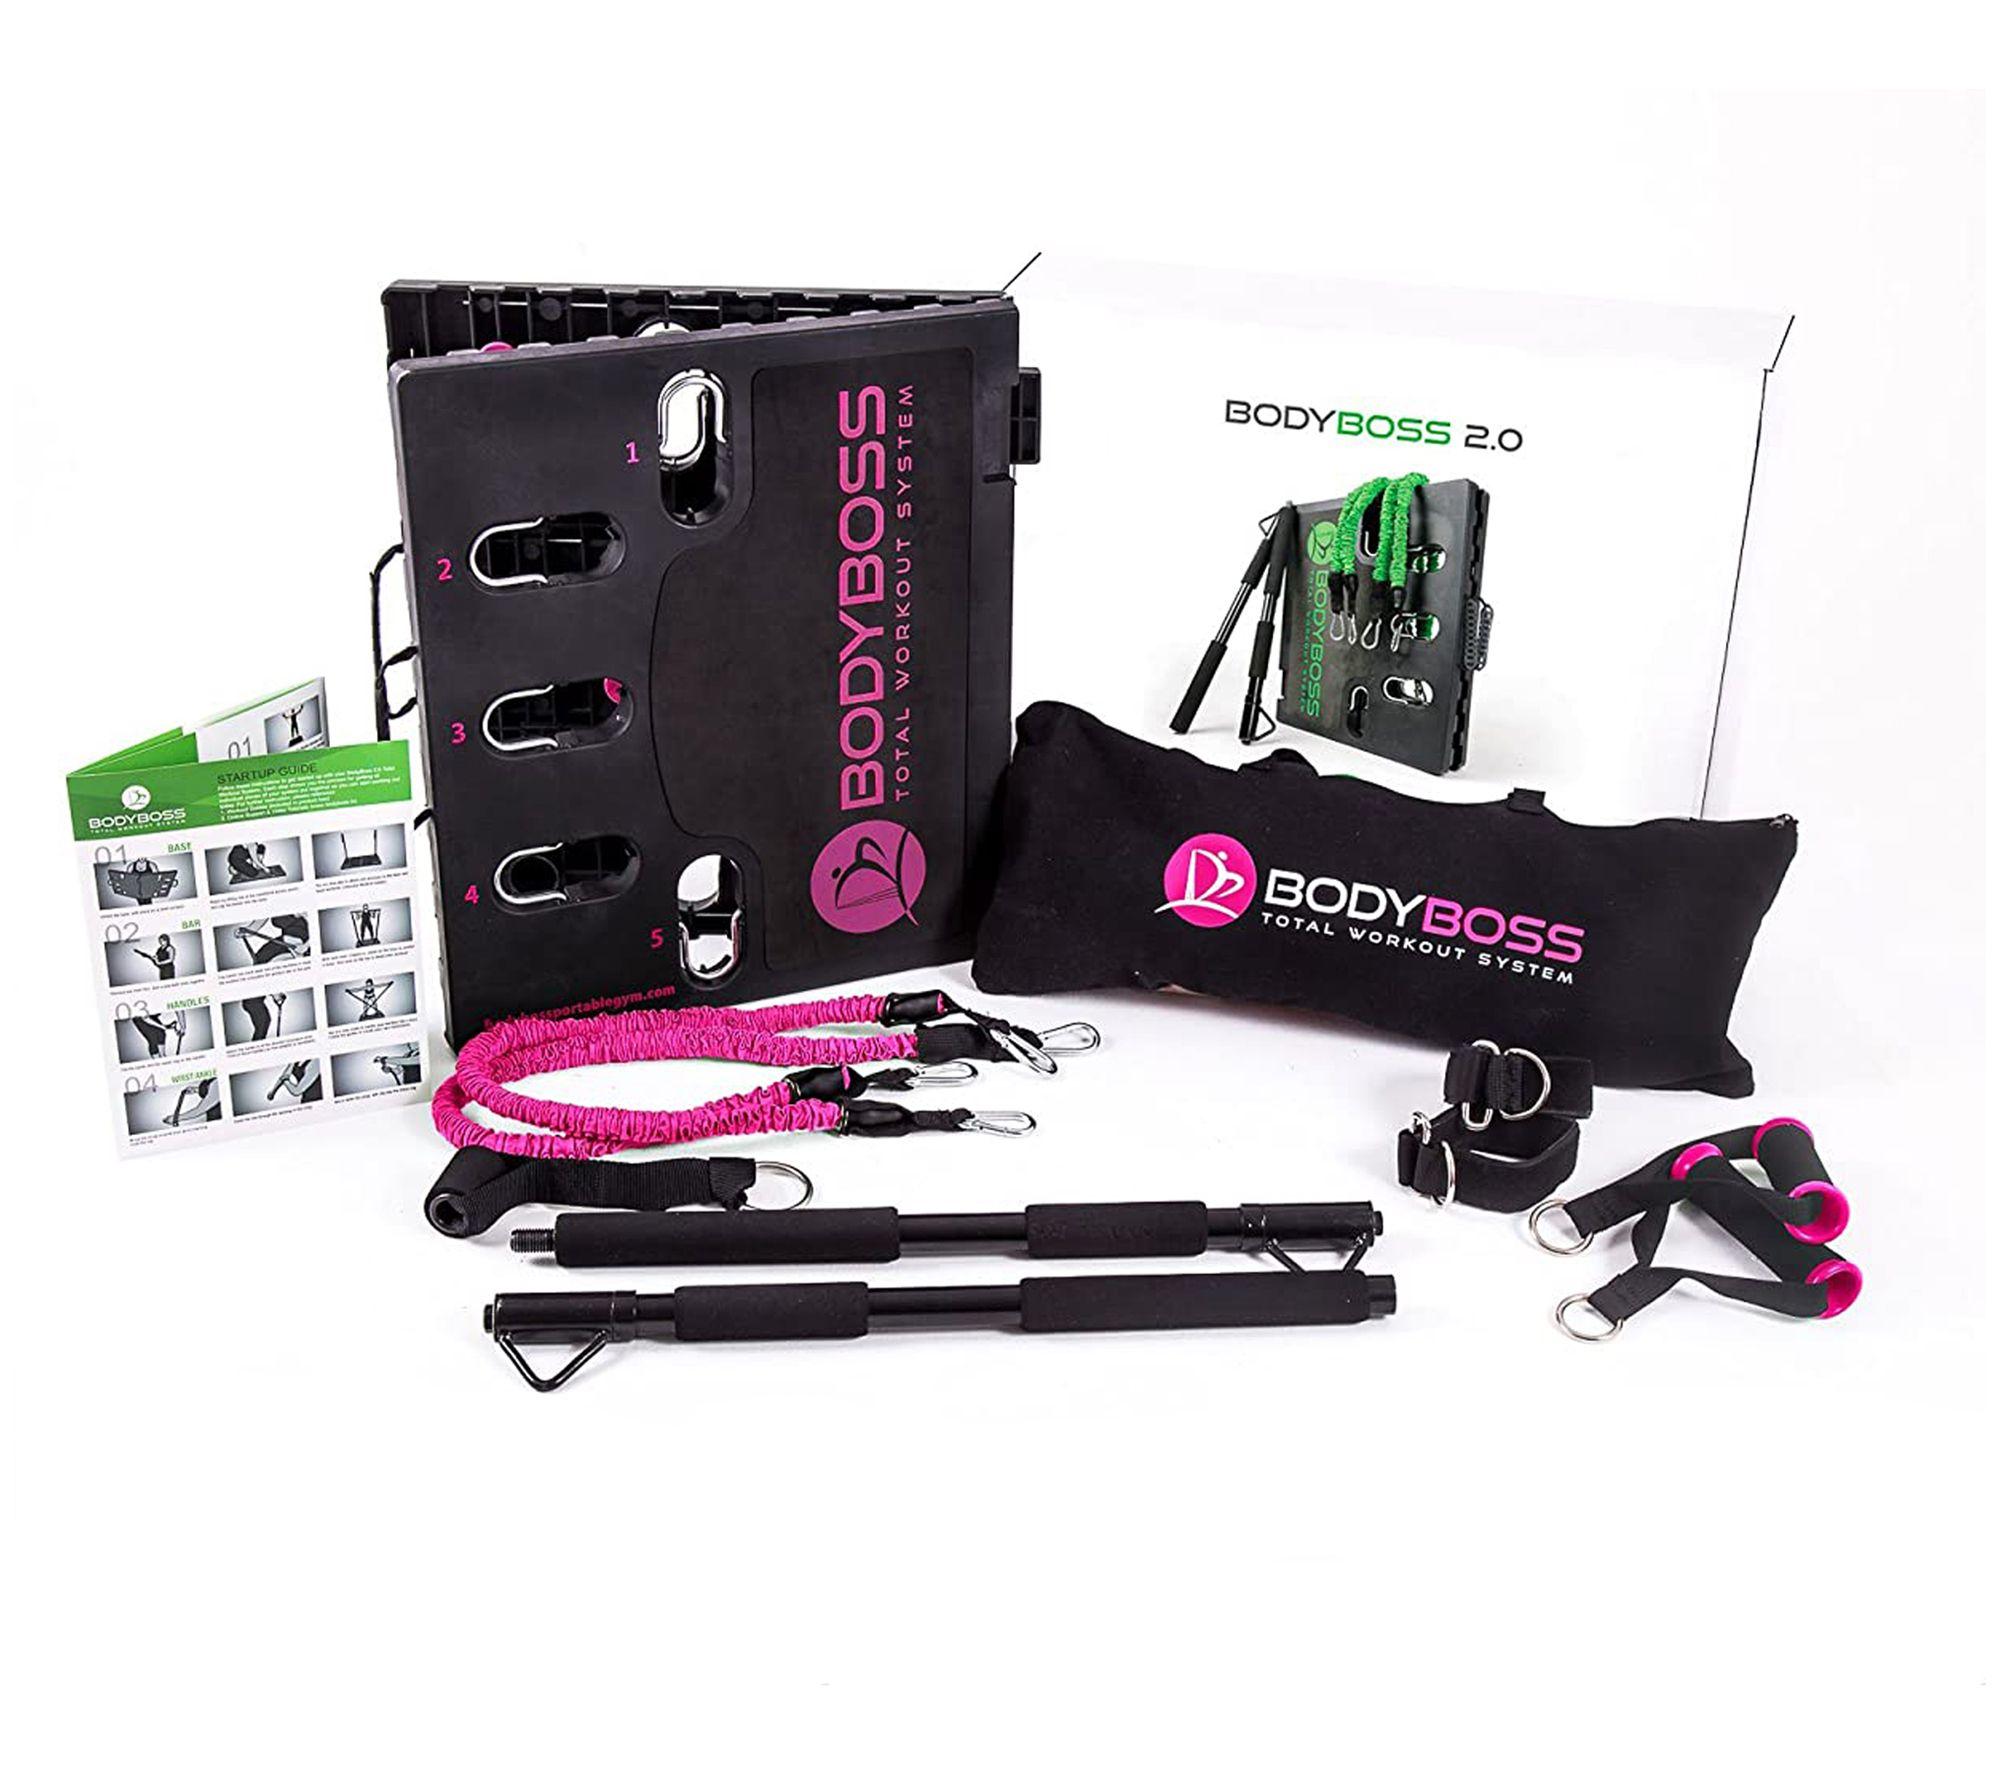 Save 17% on a BodyBoss 2.0 full portable home gym